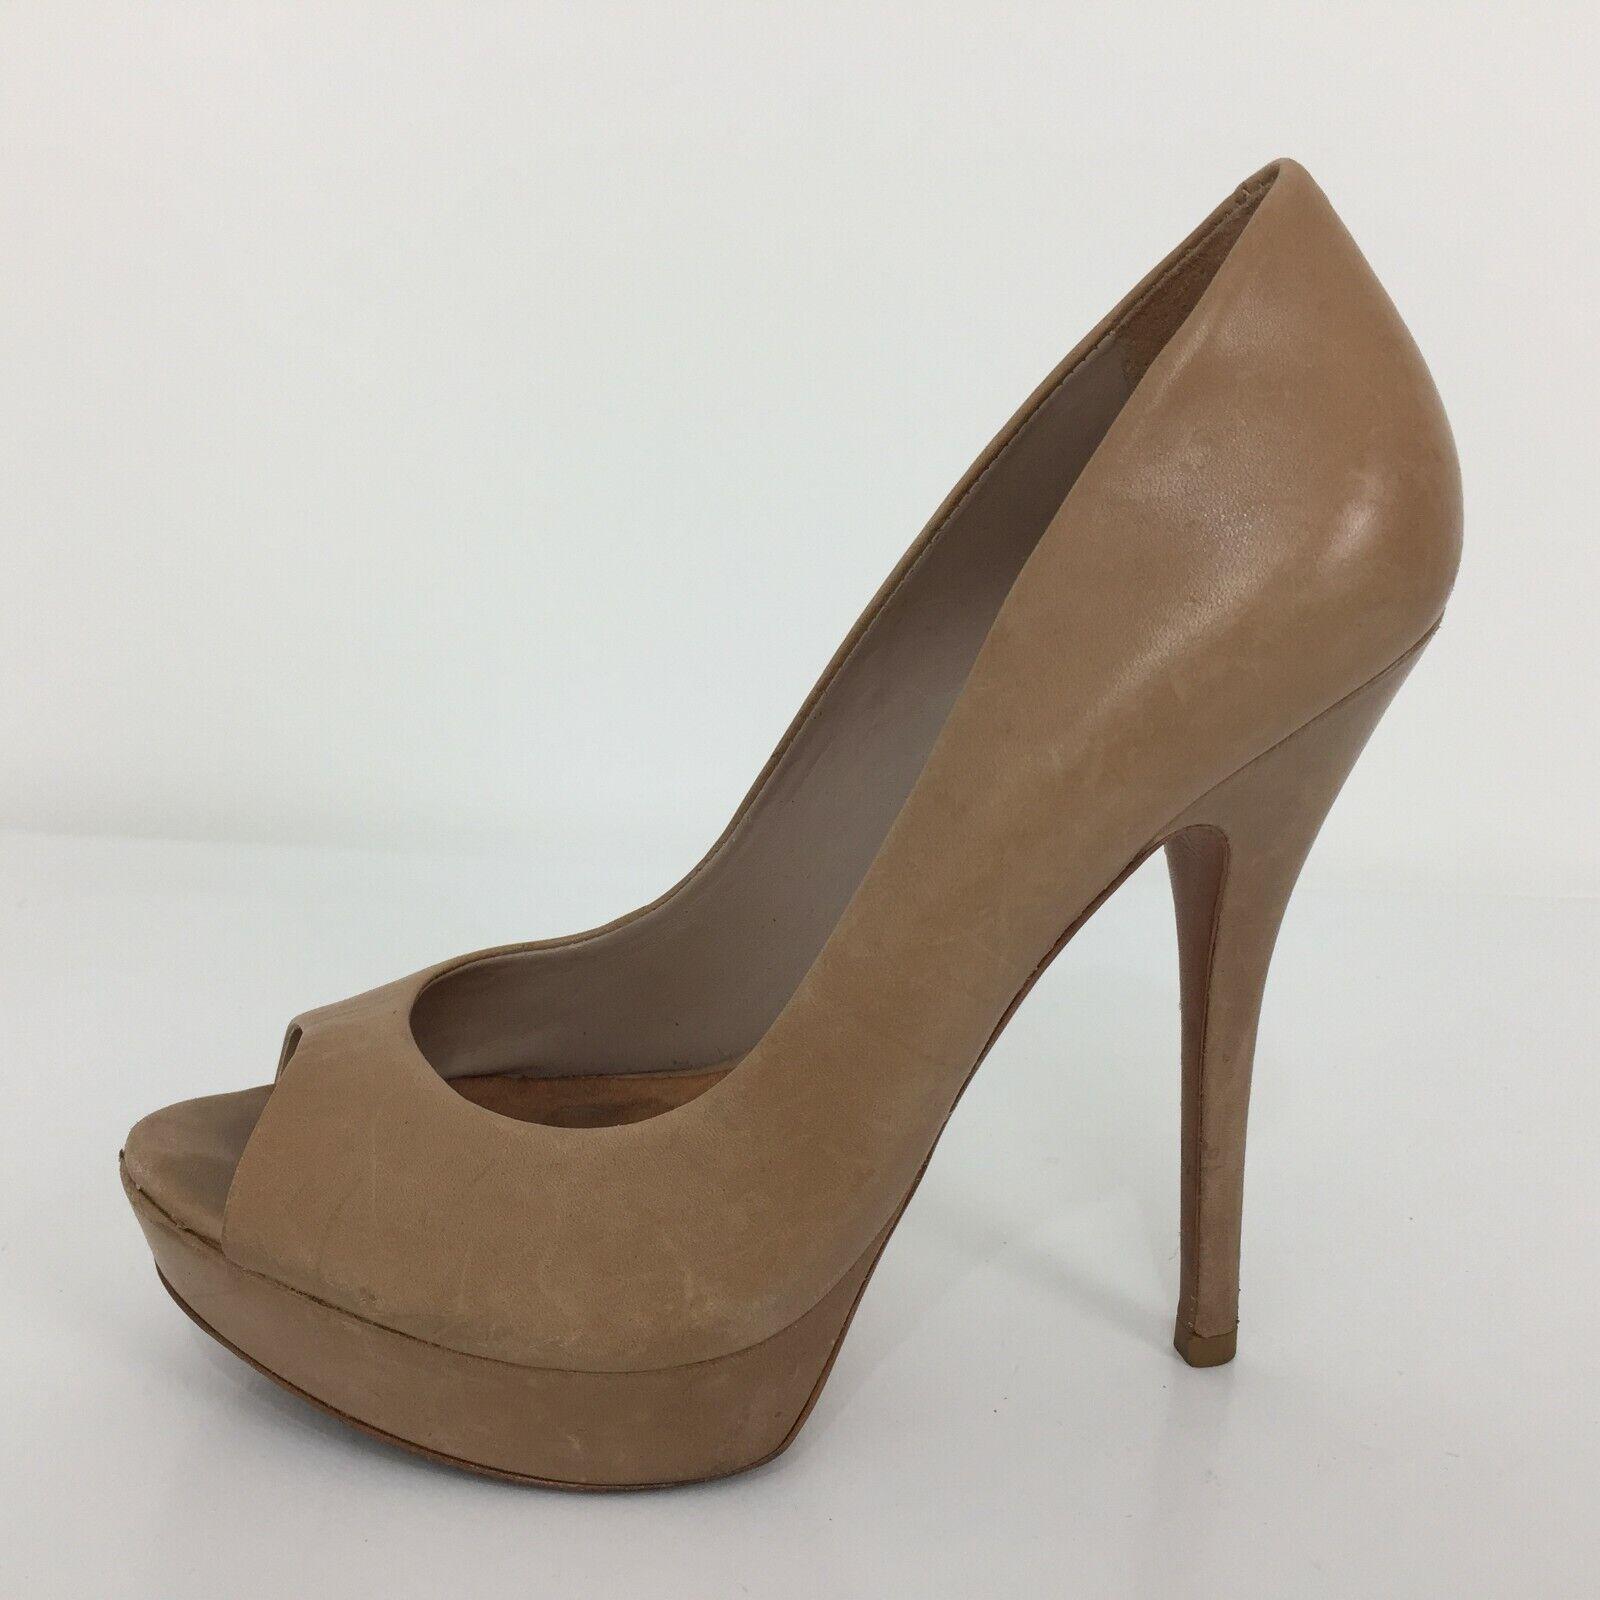 Aldo Brown Leather Stiletto Heel Women Size UK 6 Eur 39